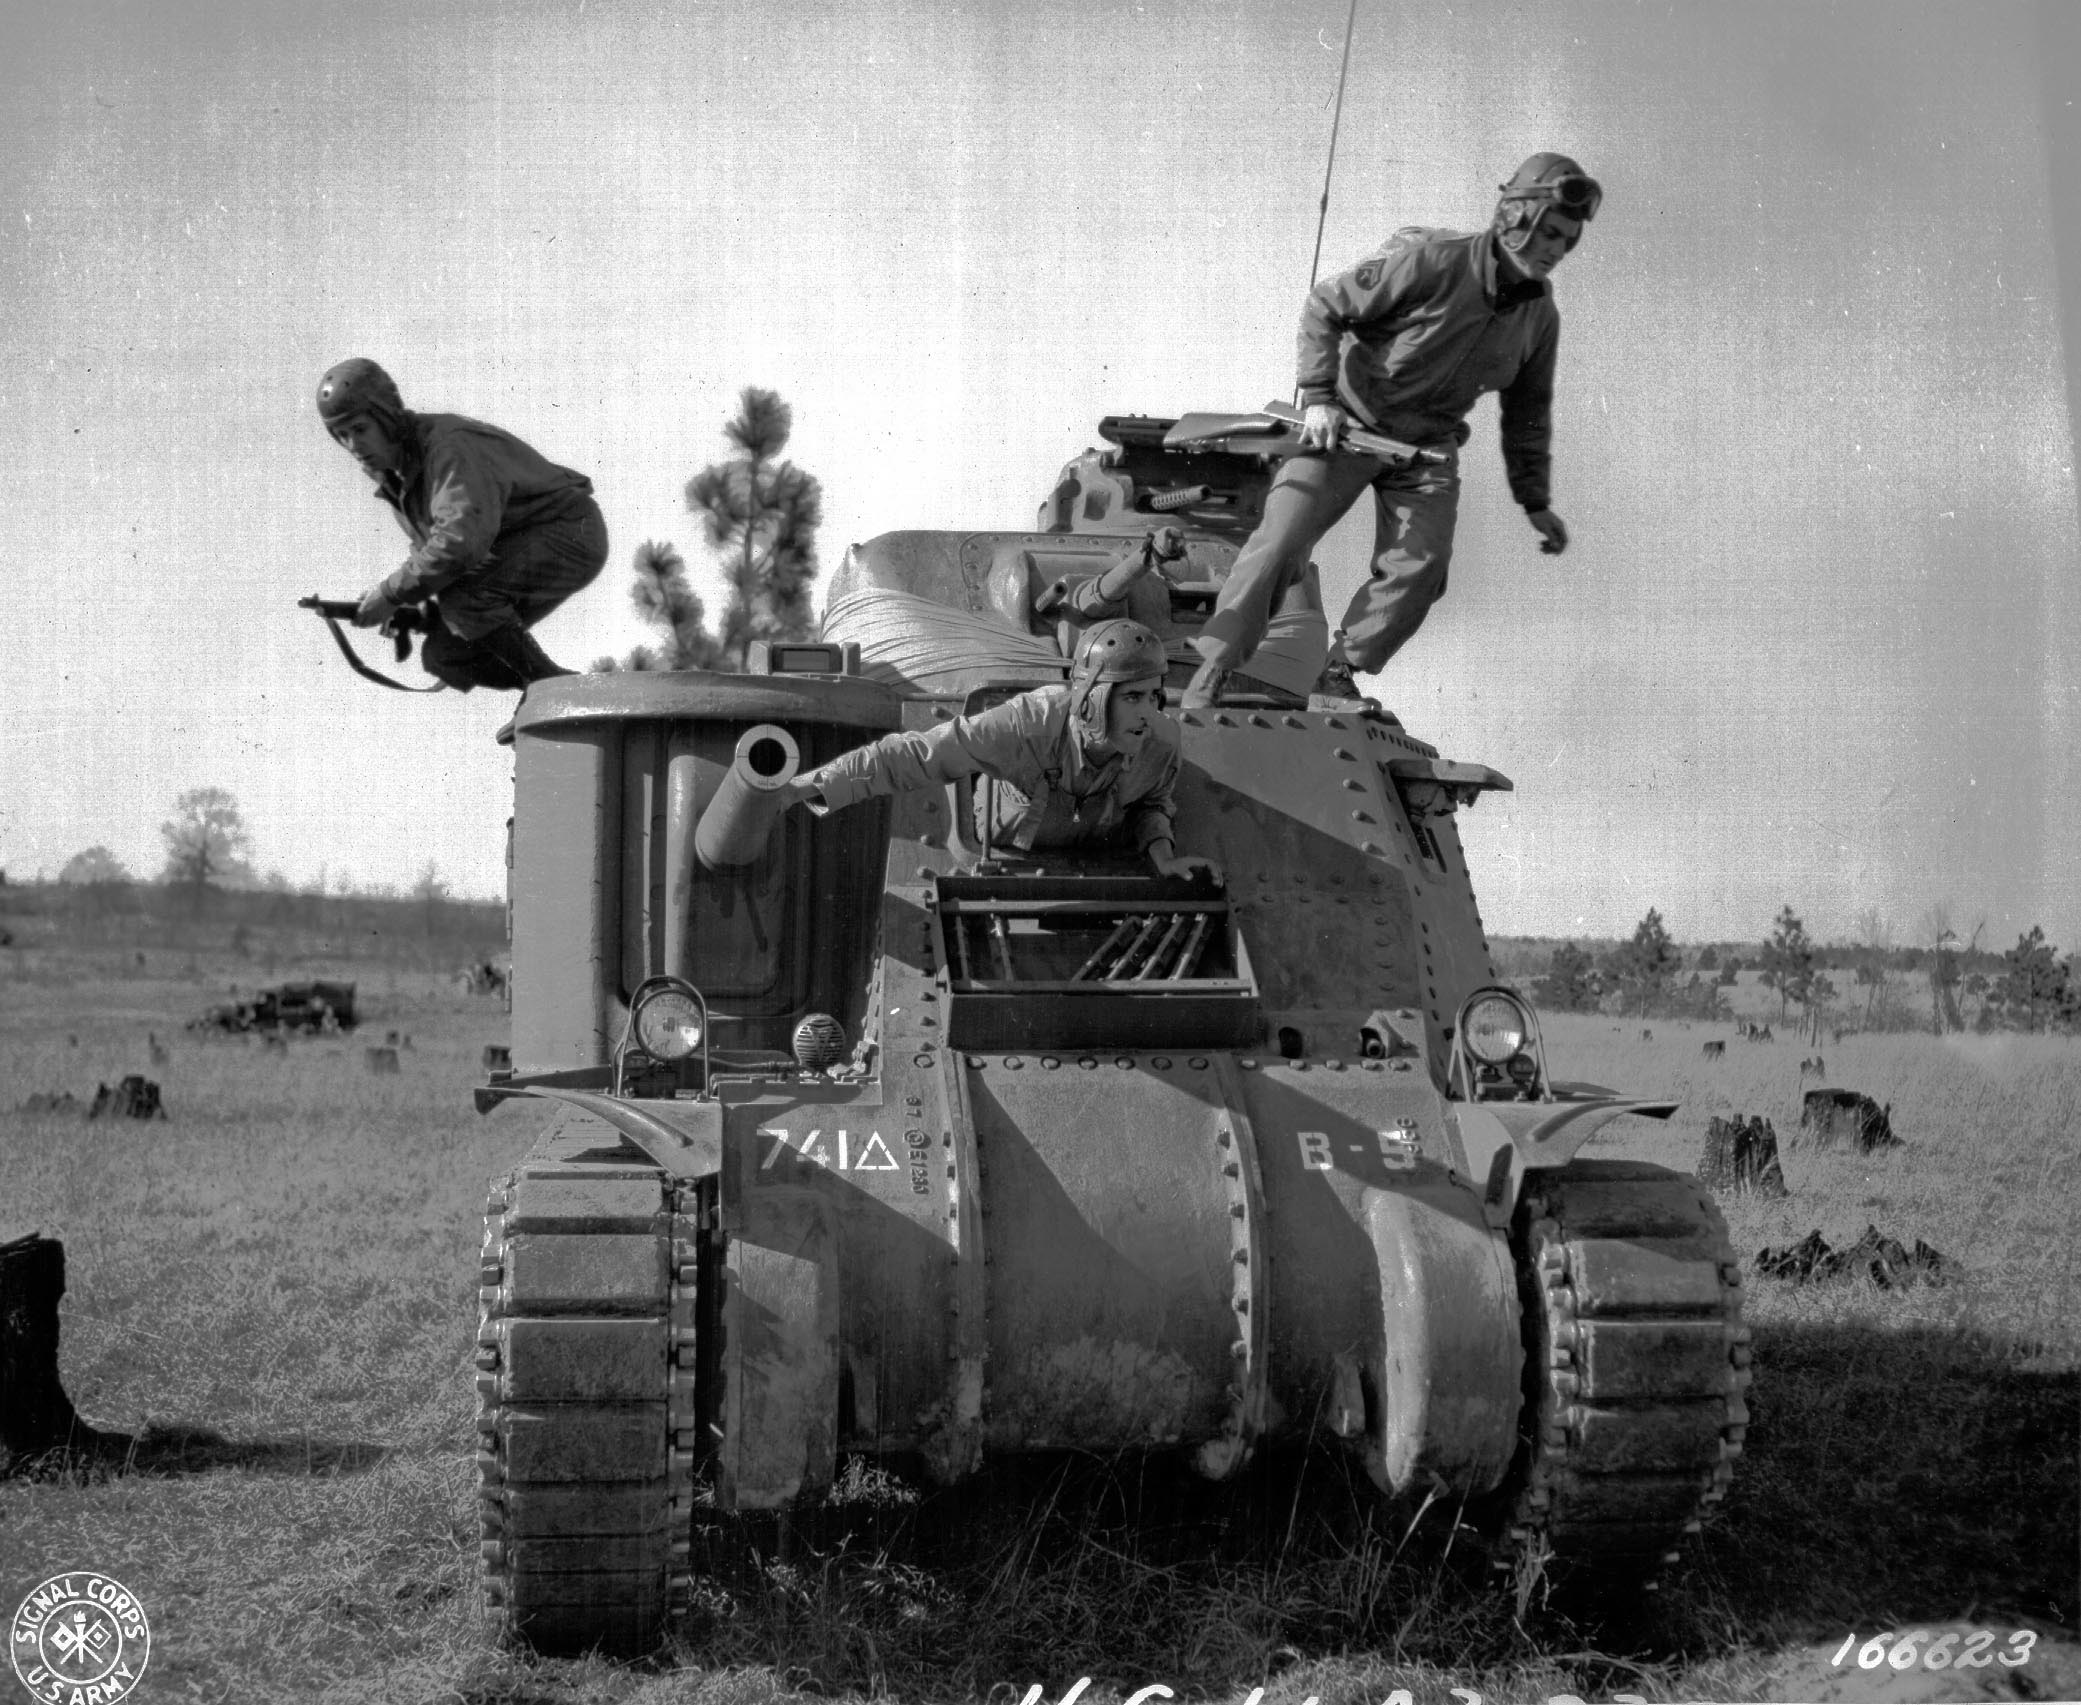 Ww2 Tanks American British And German